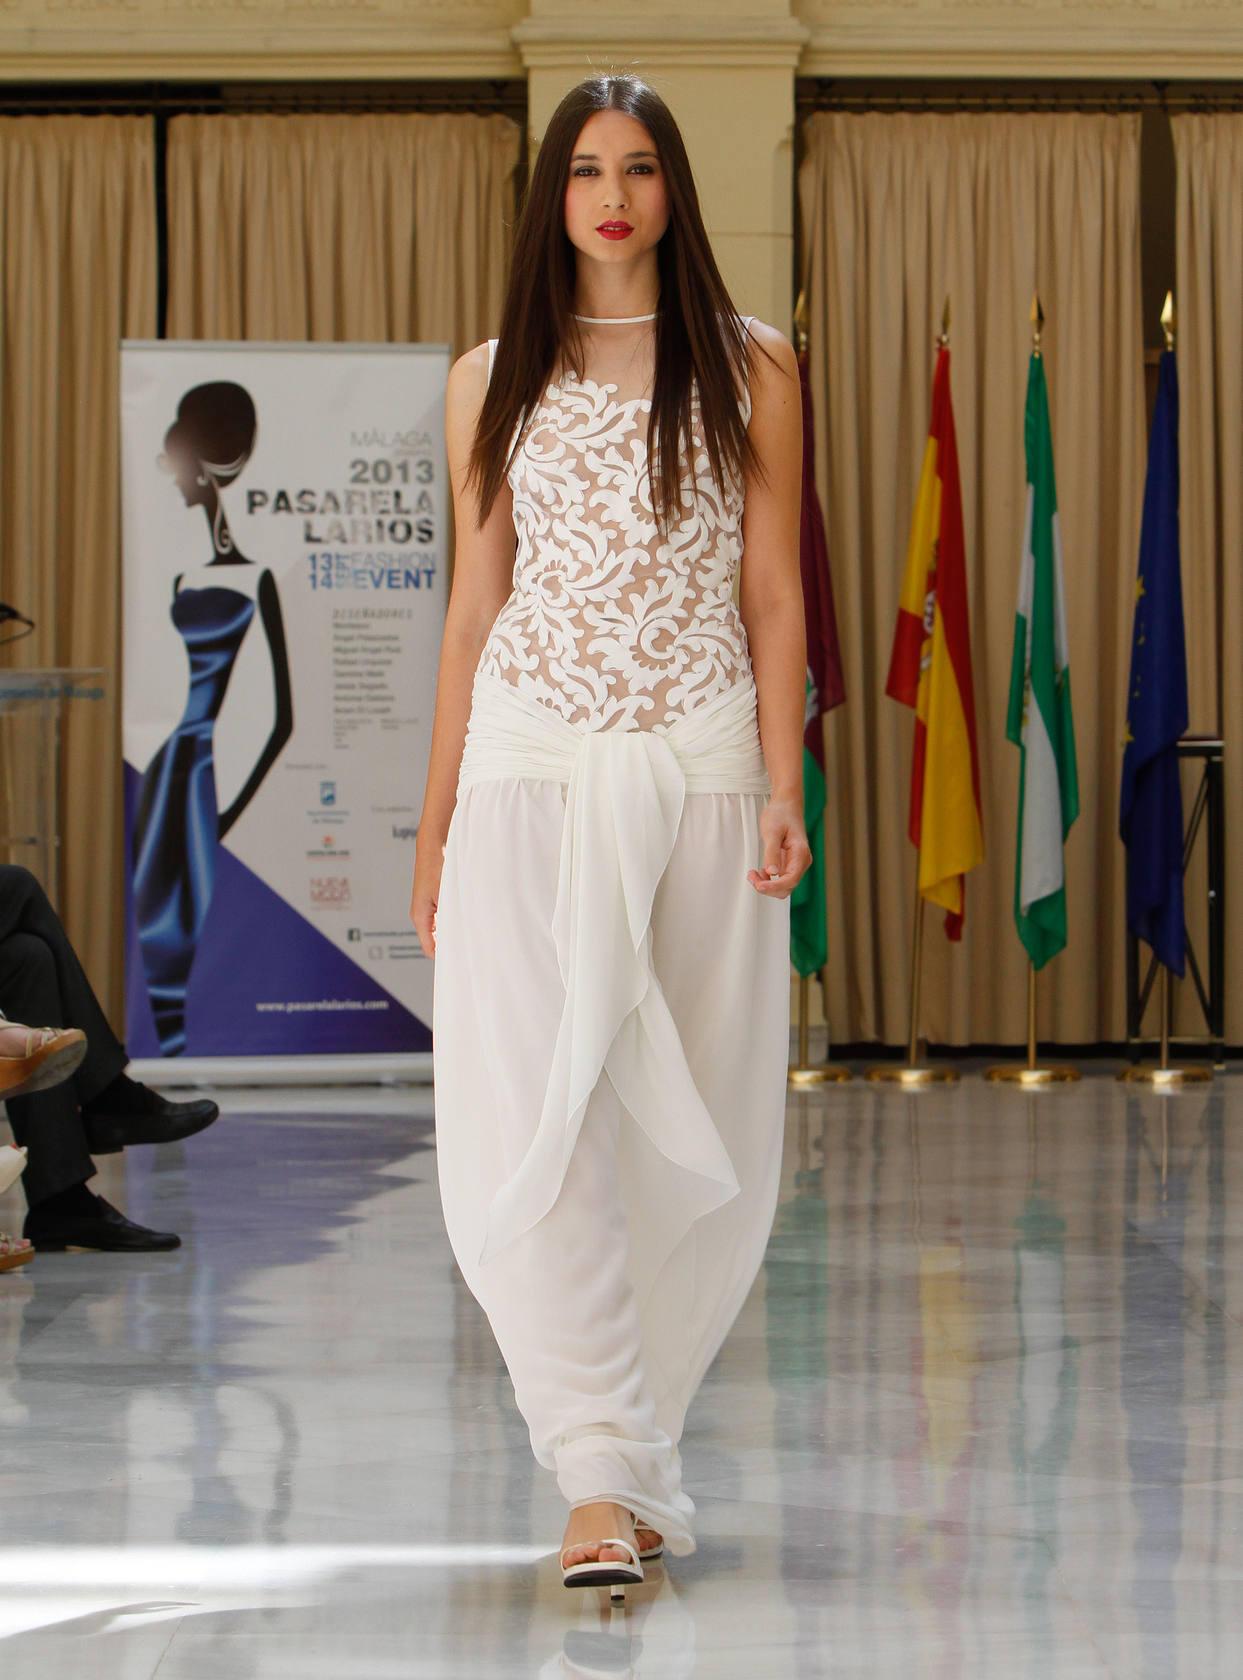 Presentación de la III Edición de Pasarela Larios Málaga Fashion Event